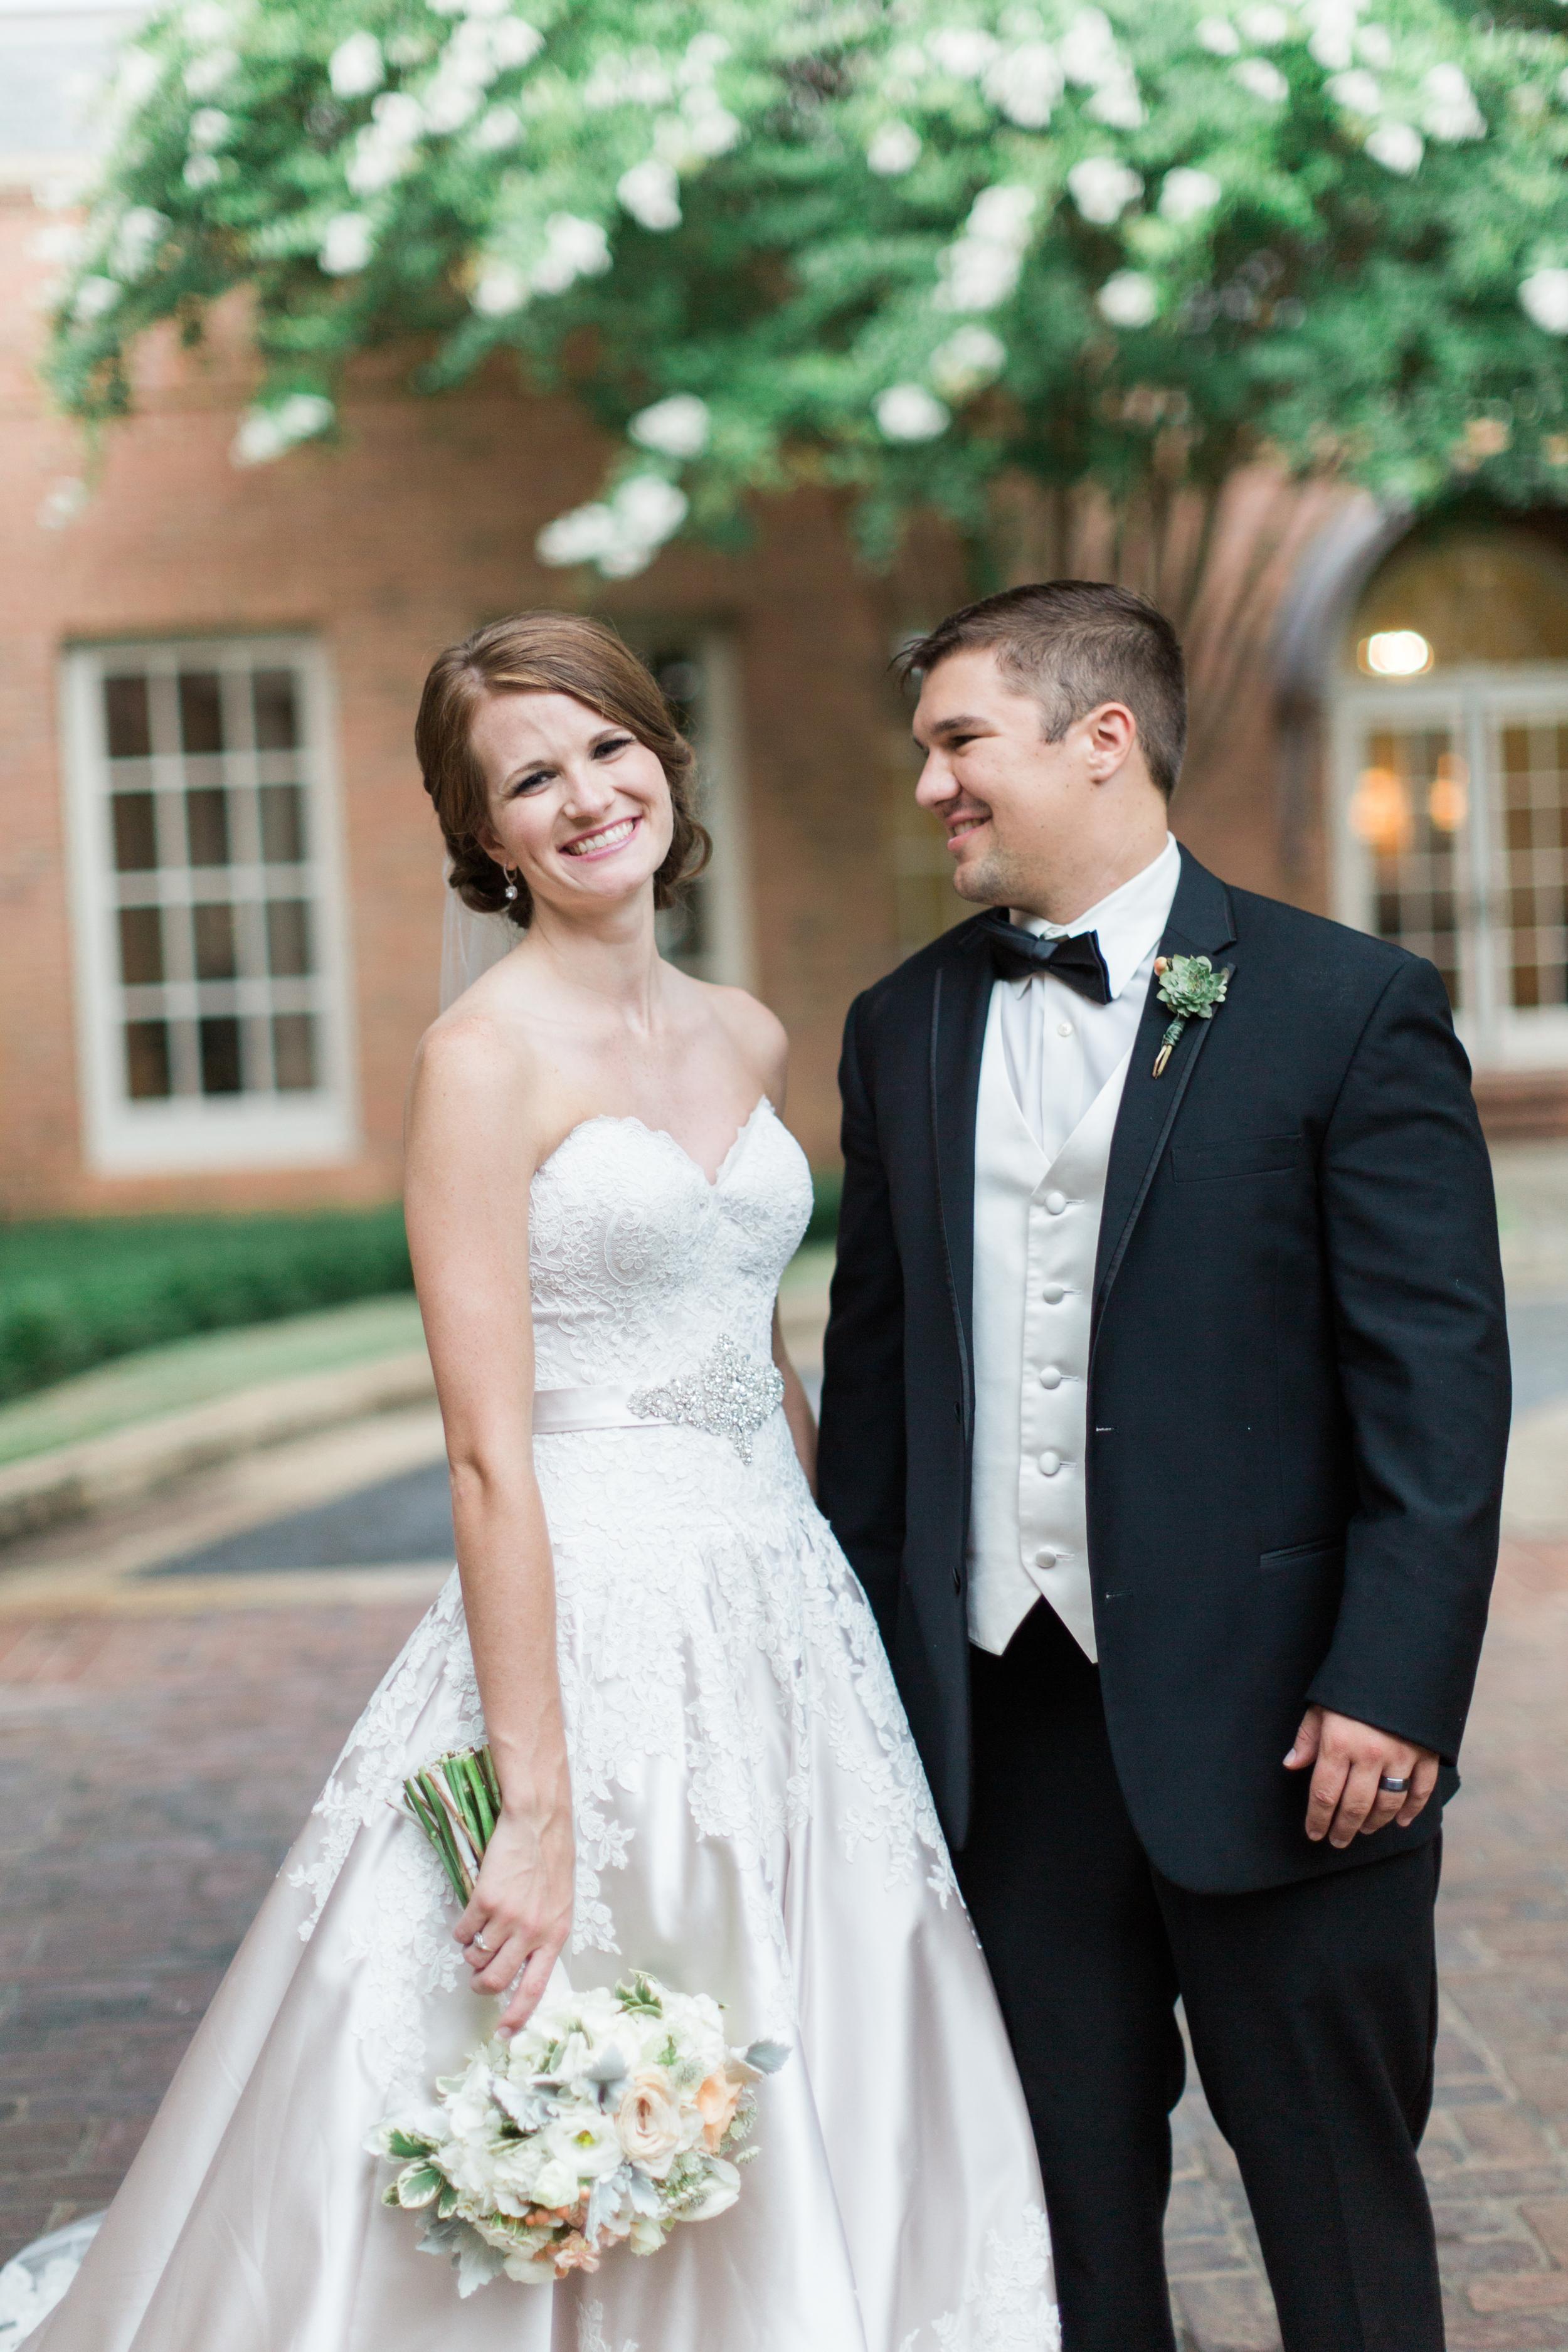 Brewbaker-Wedding-Montgomery-Alabama-Nick-Drollette-127.jpg